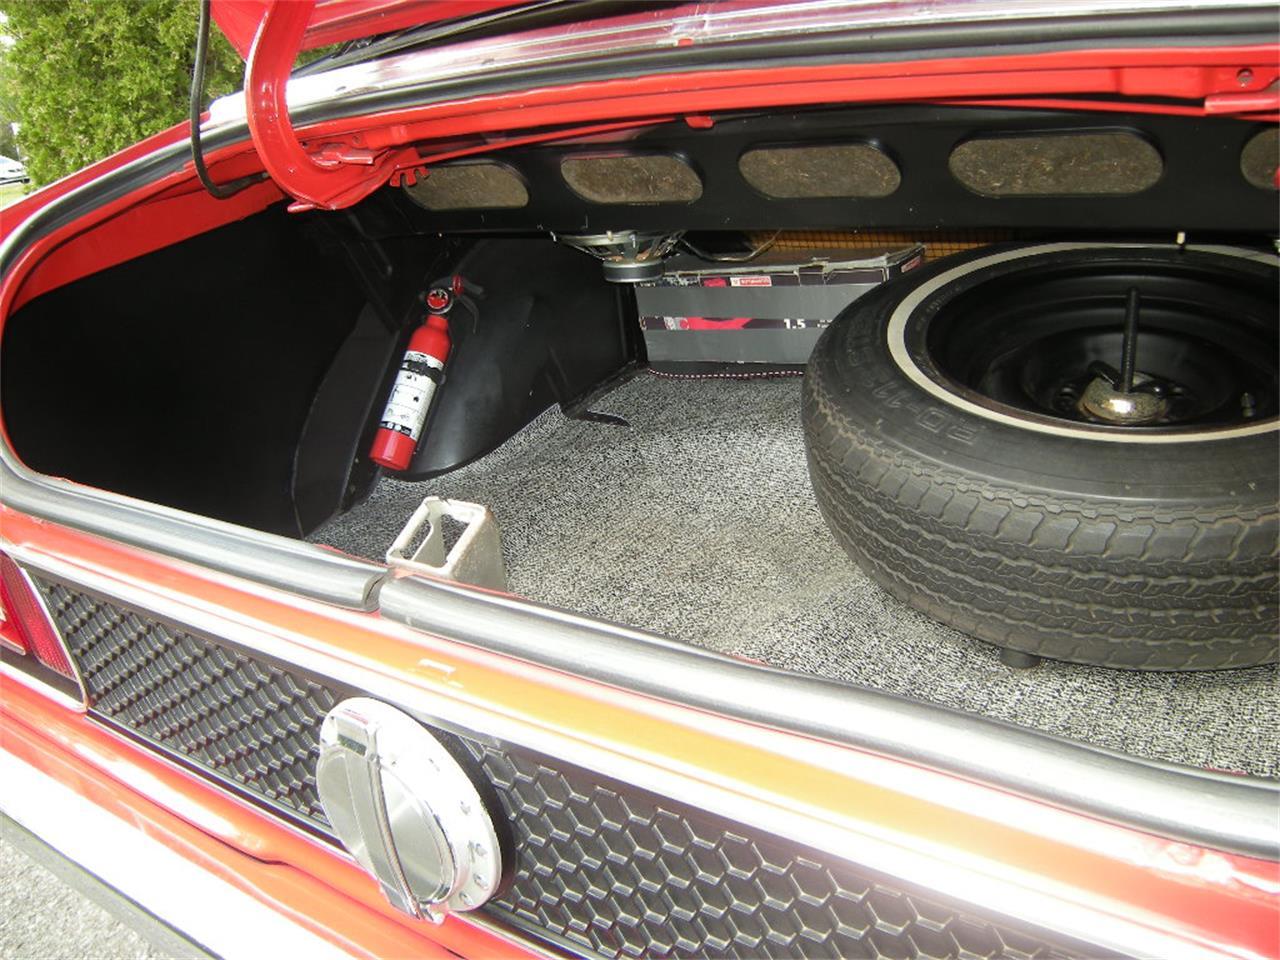 1973 Ford Mustang Mach 1 (CC-1353337) for sale in Saint Jean sur Richelieu, Quebec